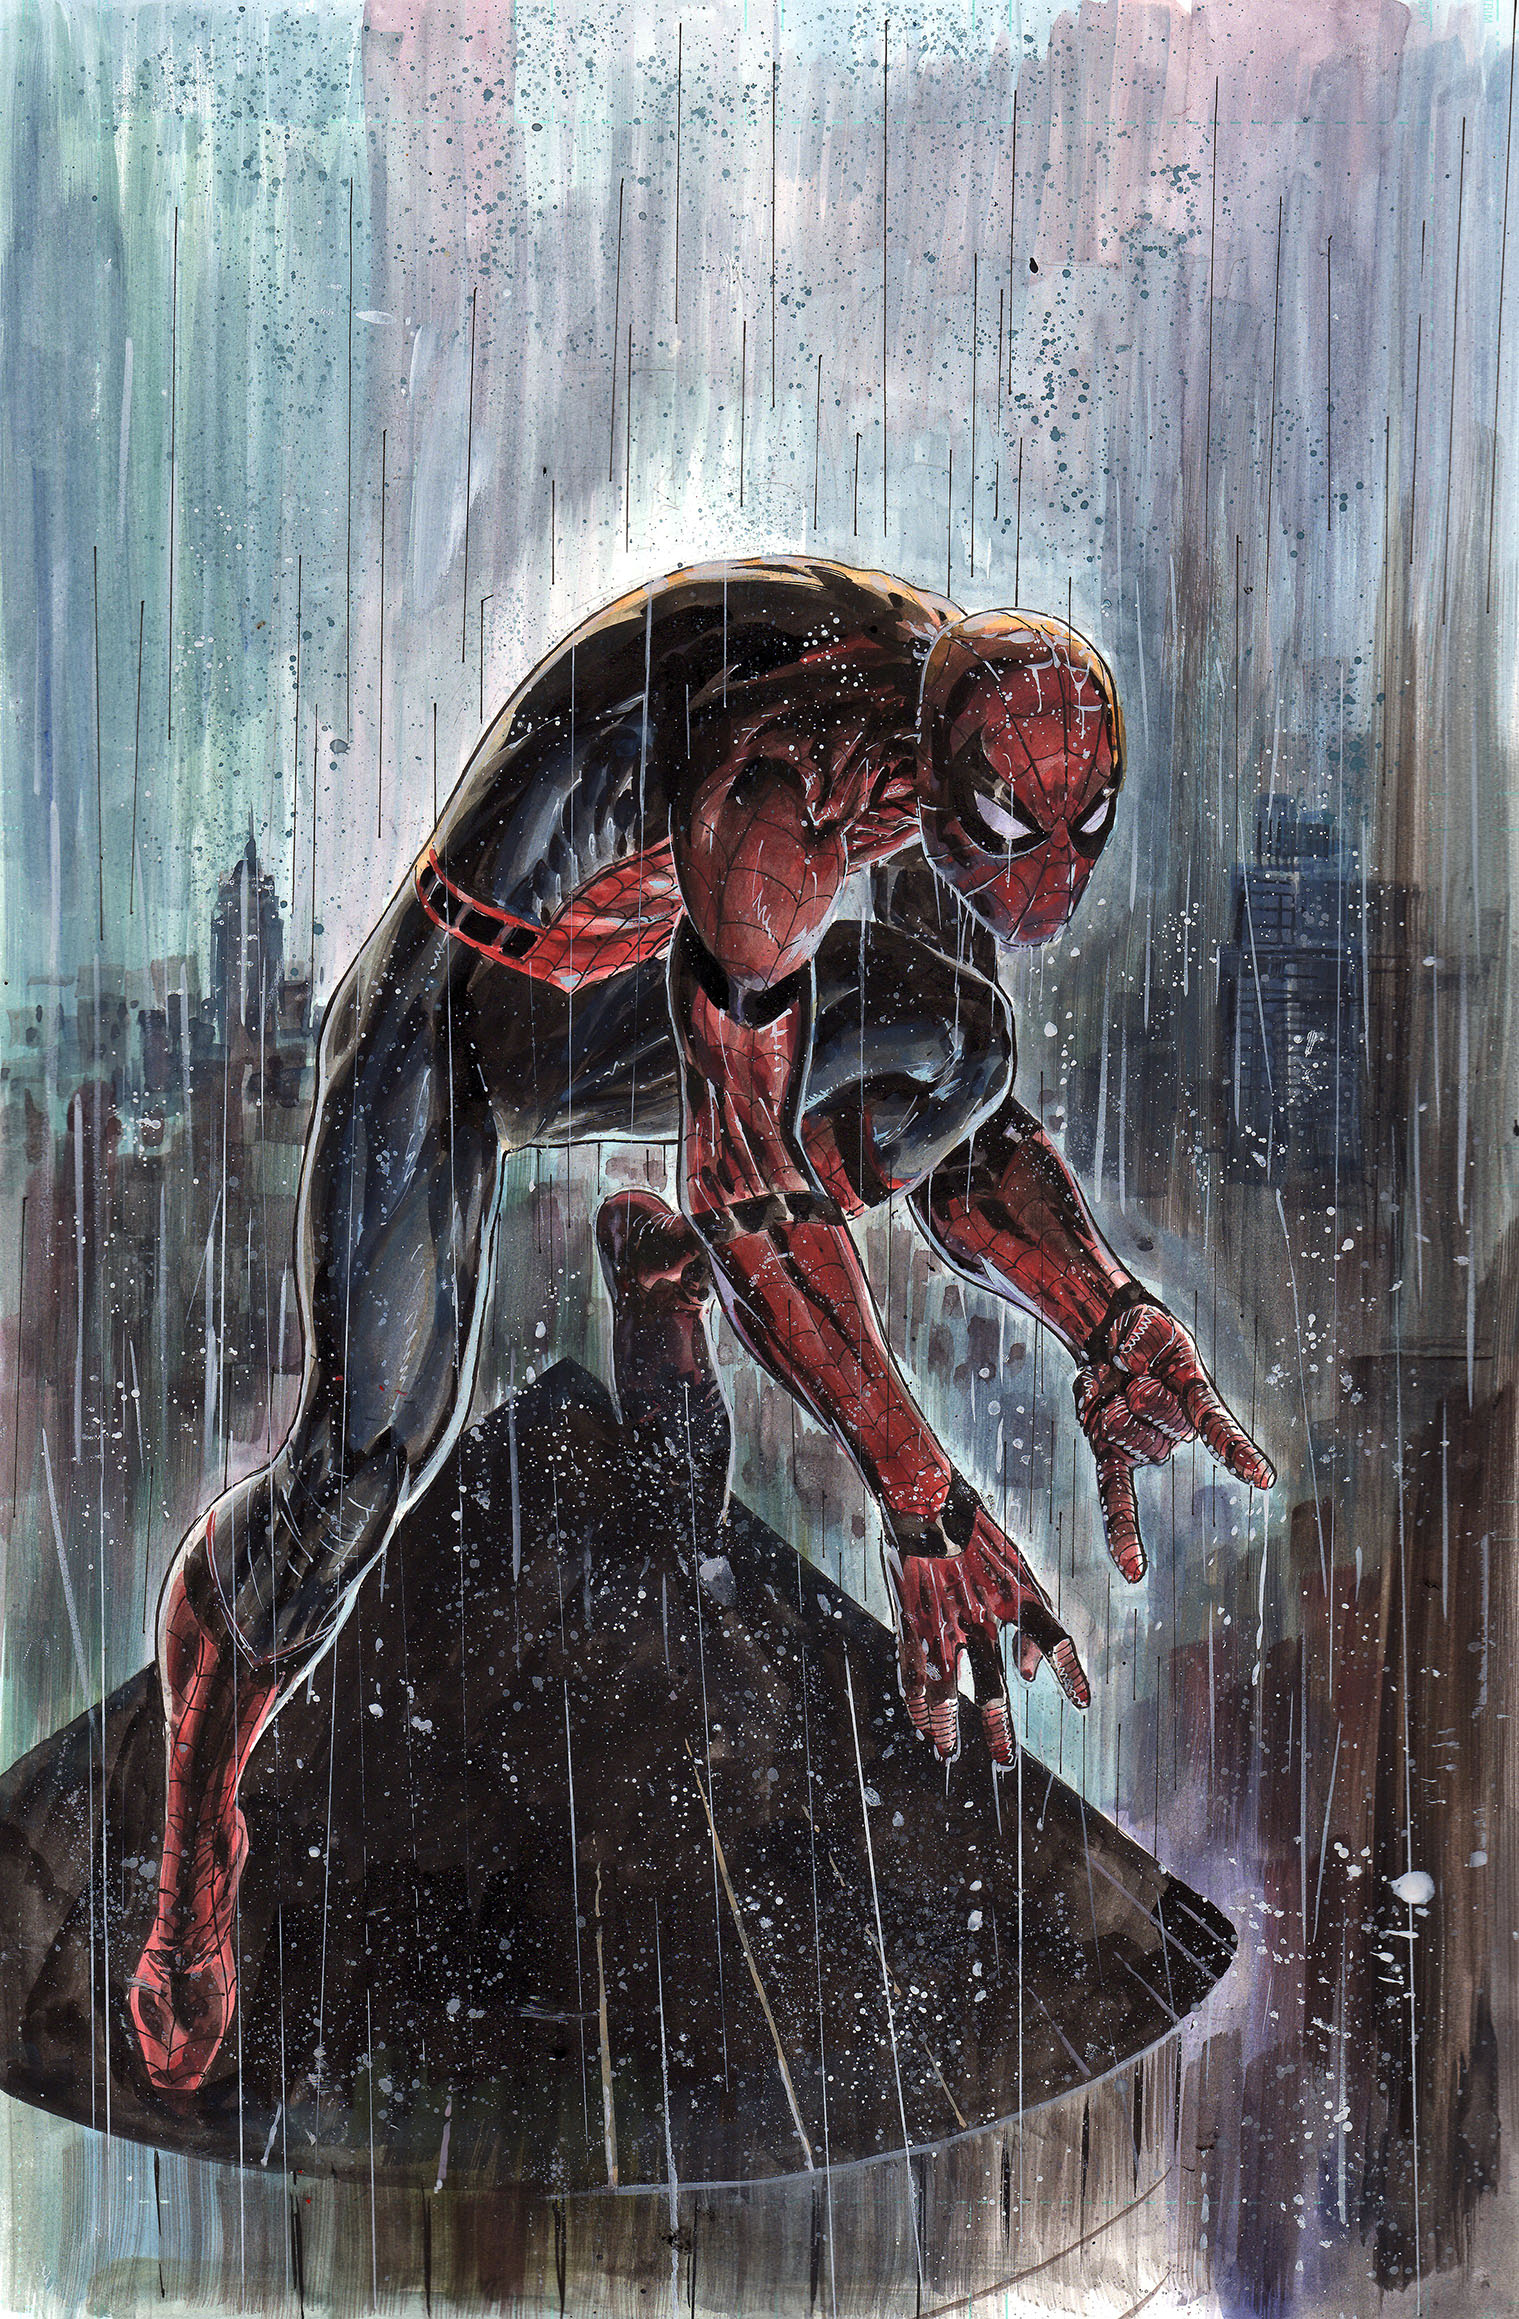 Spiderman by ardian-syaf on DeviantArt